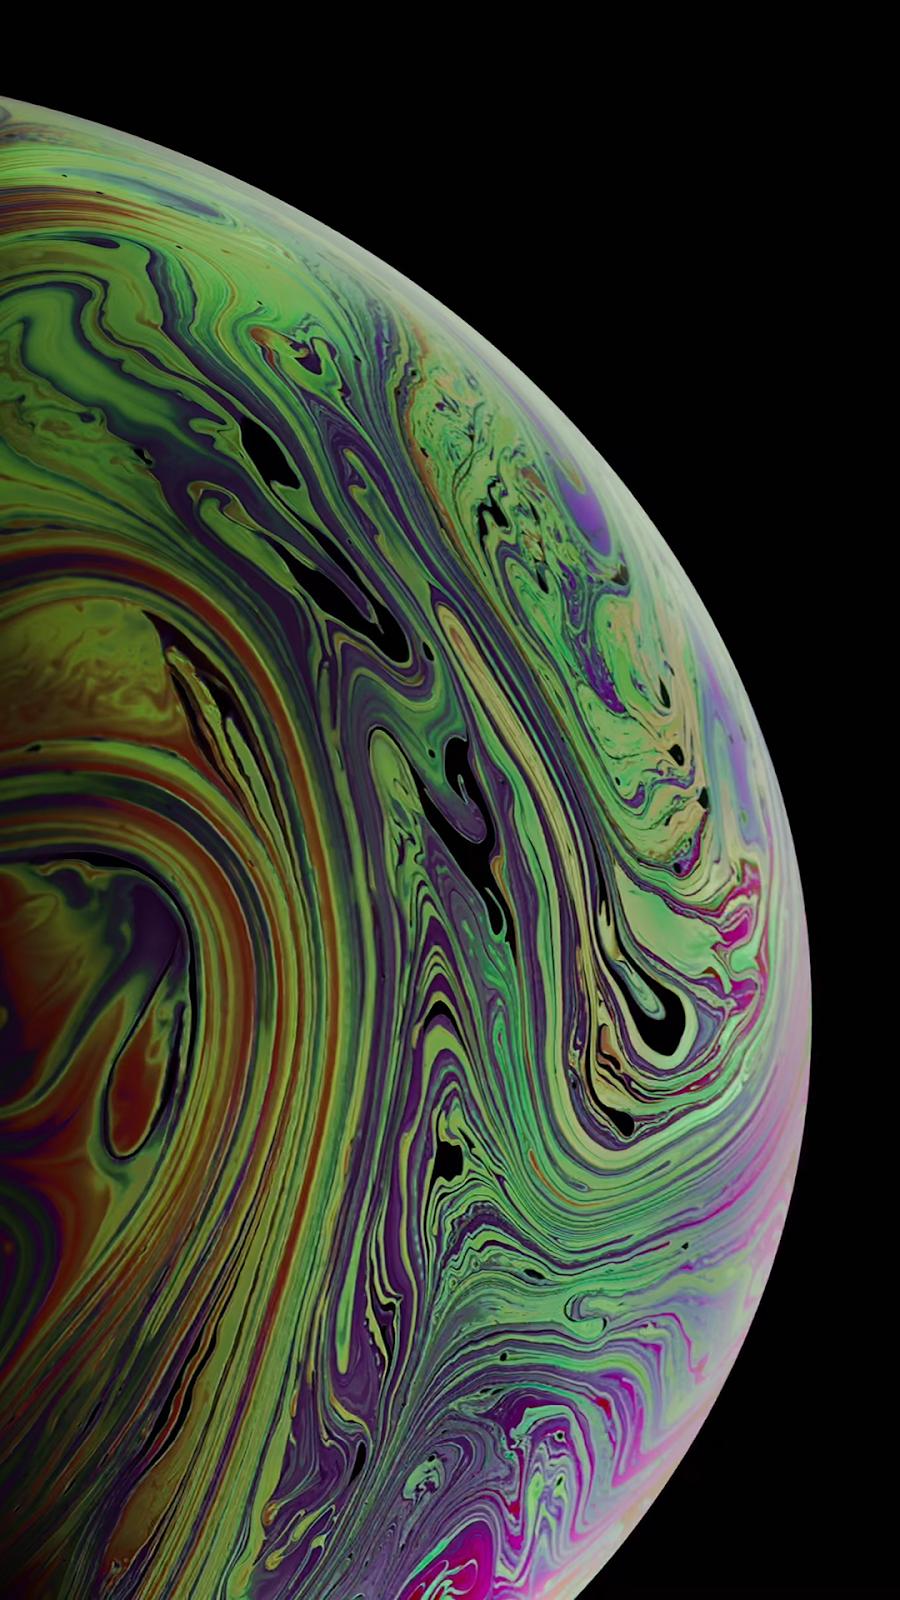 Iphone Xr Wallpaper 4k Nature mywallpapers site Retina